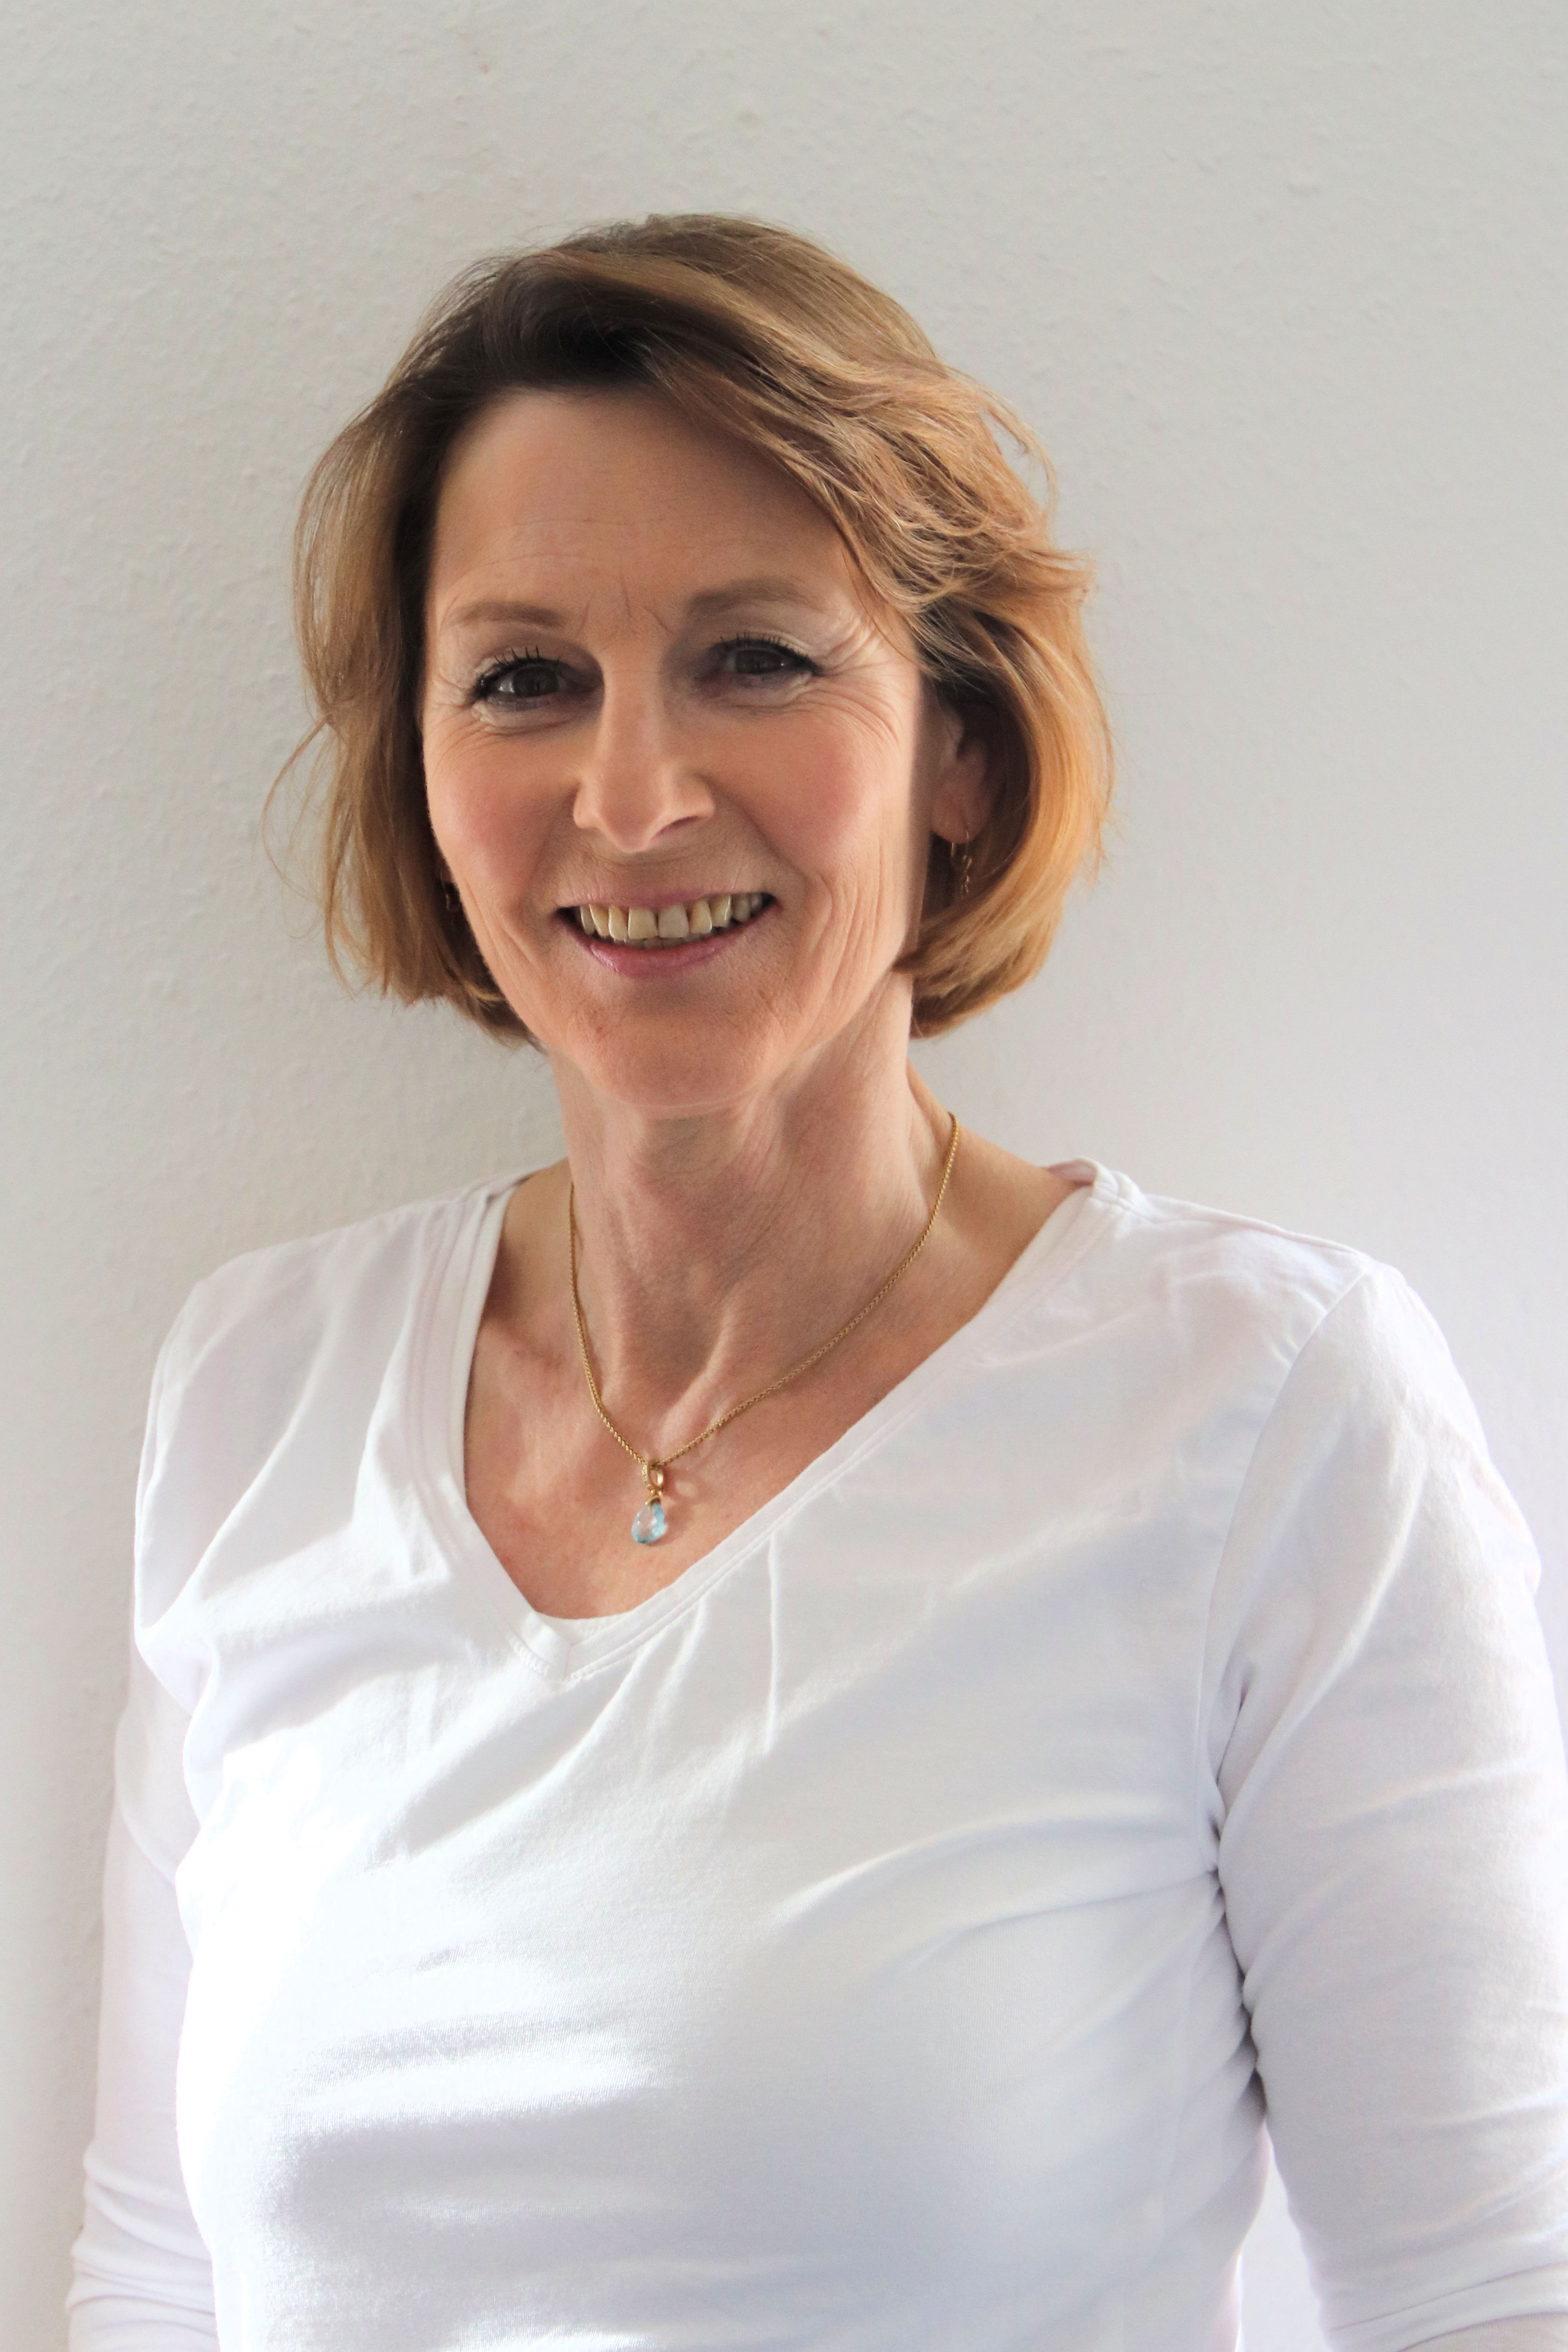 Gabriele Wolff: Physio Kolb & Wolff, Krankengymnastik Wolff